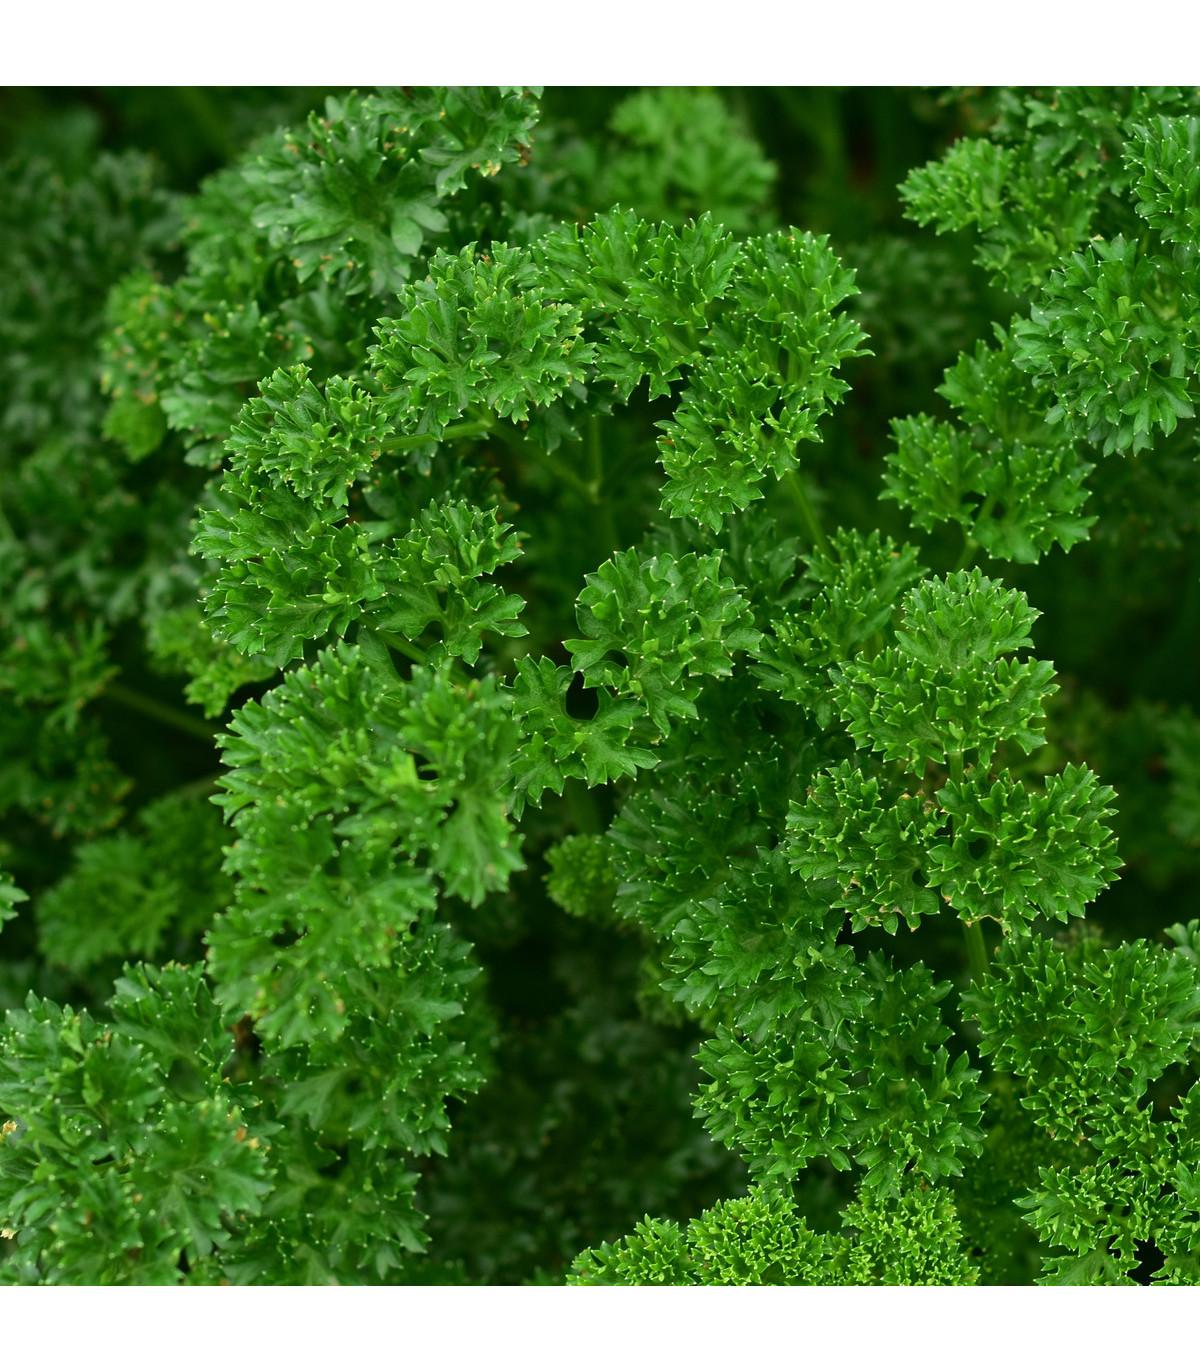 Petržel naťová Zelená Perla - Petroselinum crispu - semena petržele - 1 g